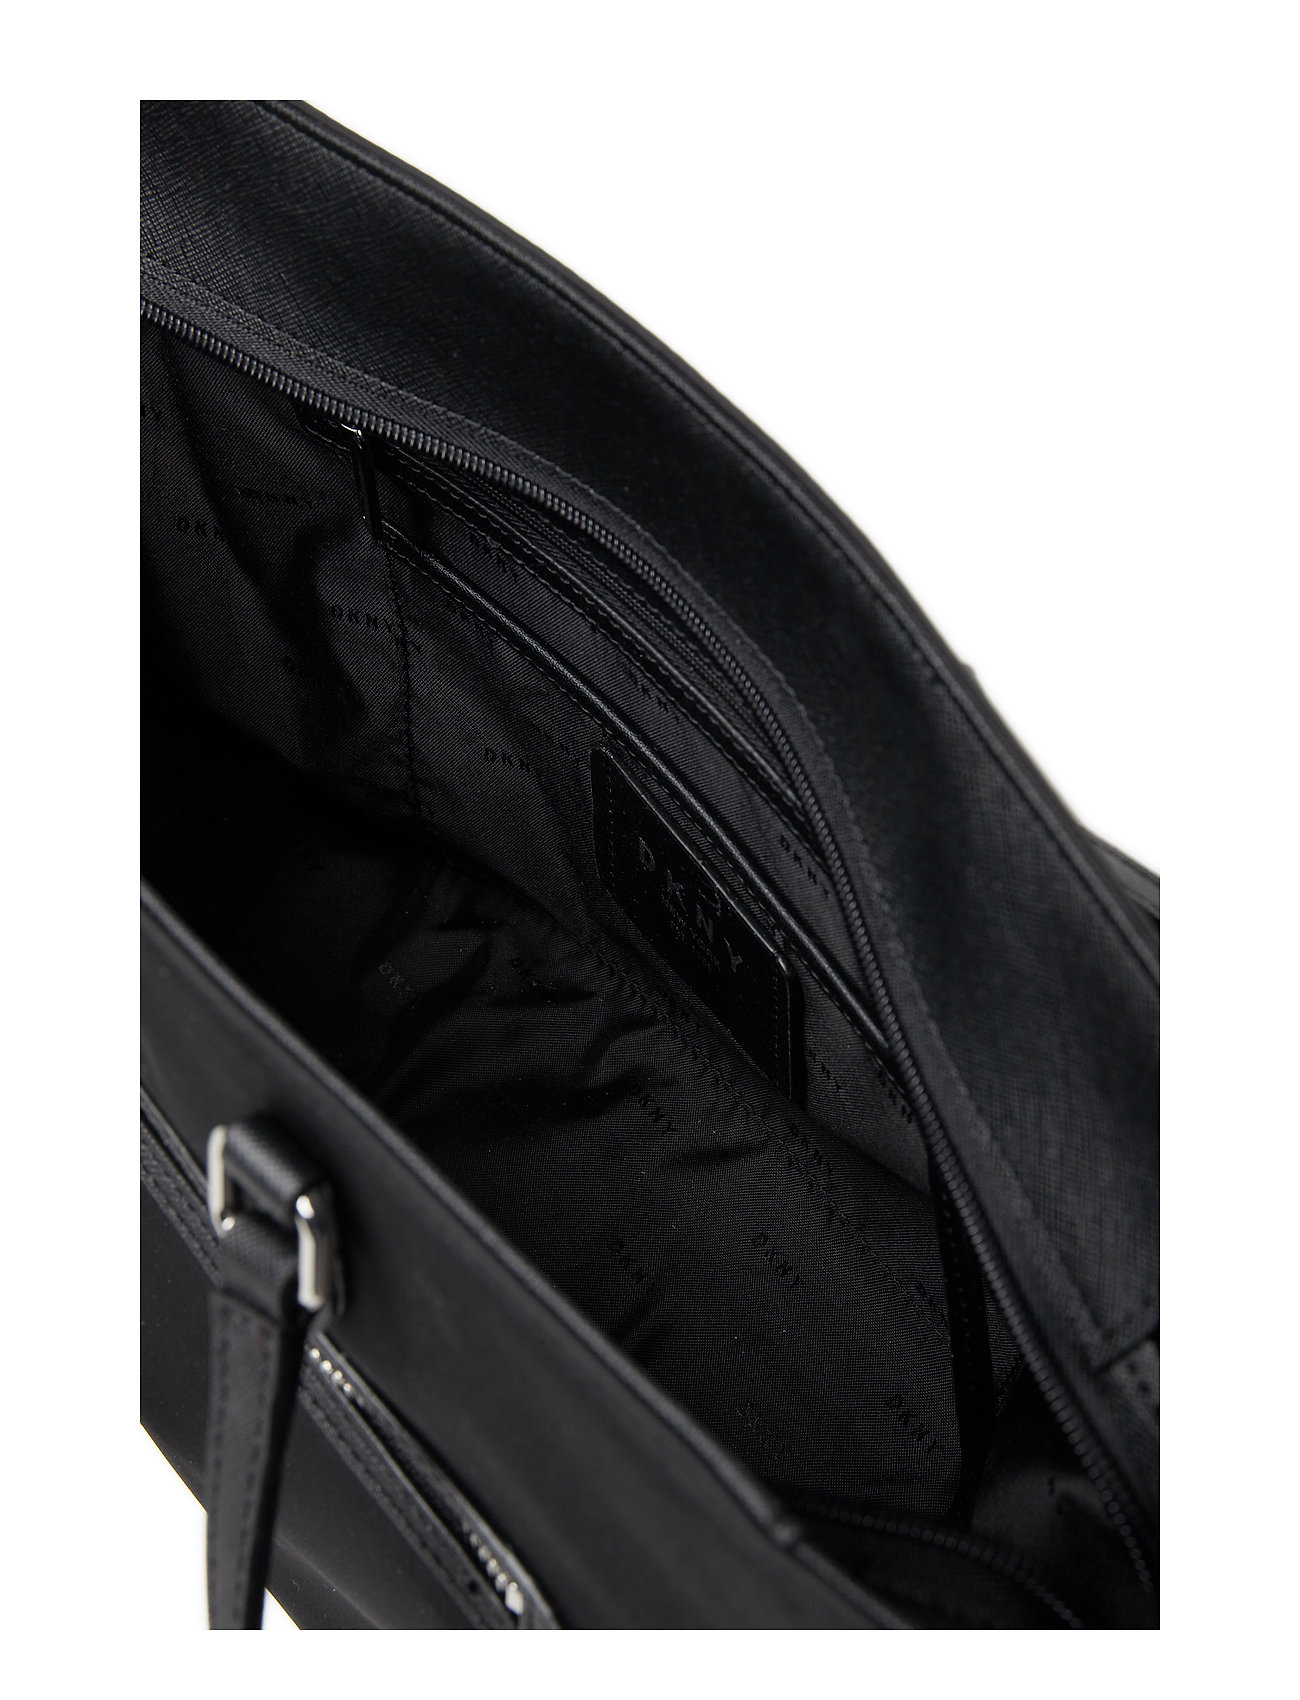 Kadenblack Bags silverDkny Bags Kadenblack silverDkny Kadenblack cj3Lq54AR